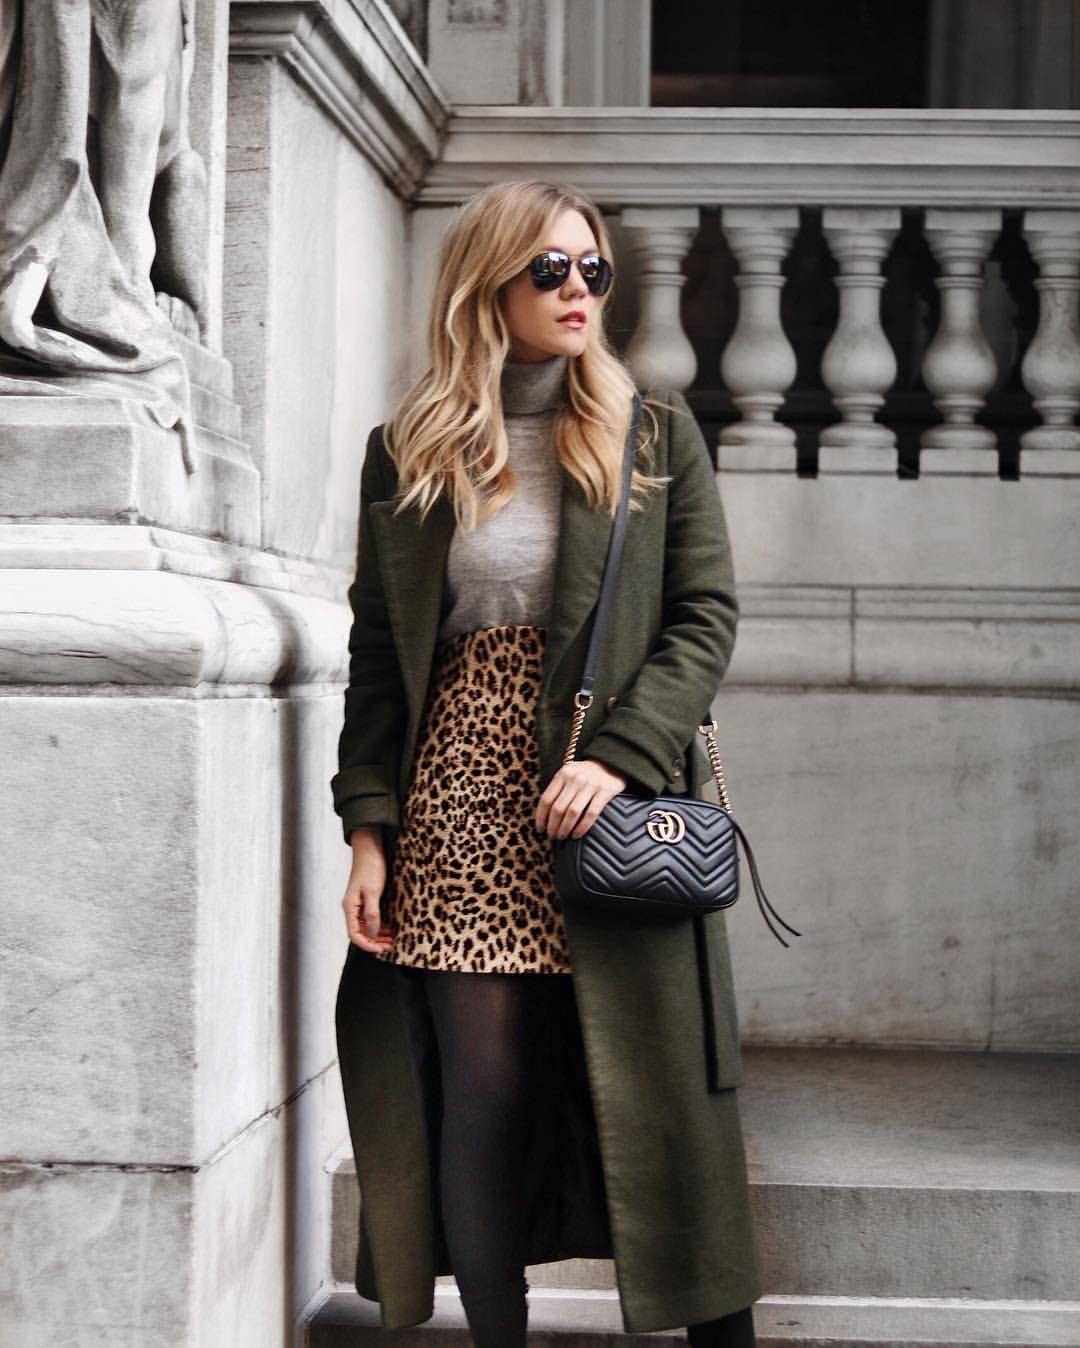 4d3dbdc8c1d4 Gucci Handbags, Luxury Handbags, Fashion Handbags, Fashion Bags, Gucci  Marmont Mini,